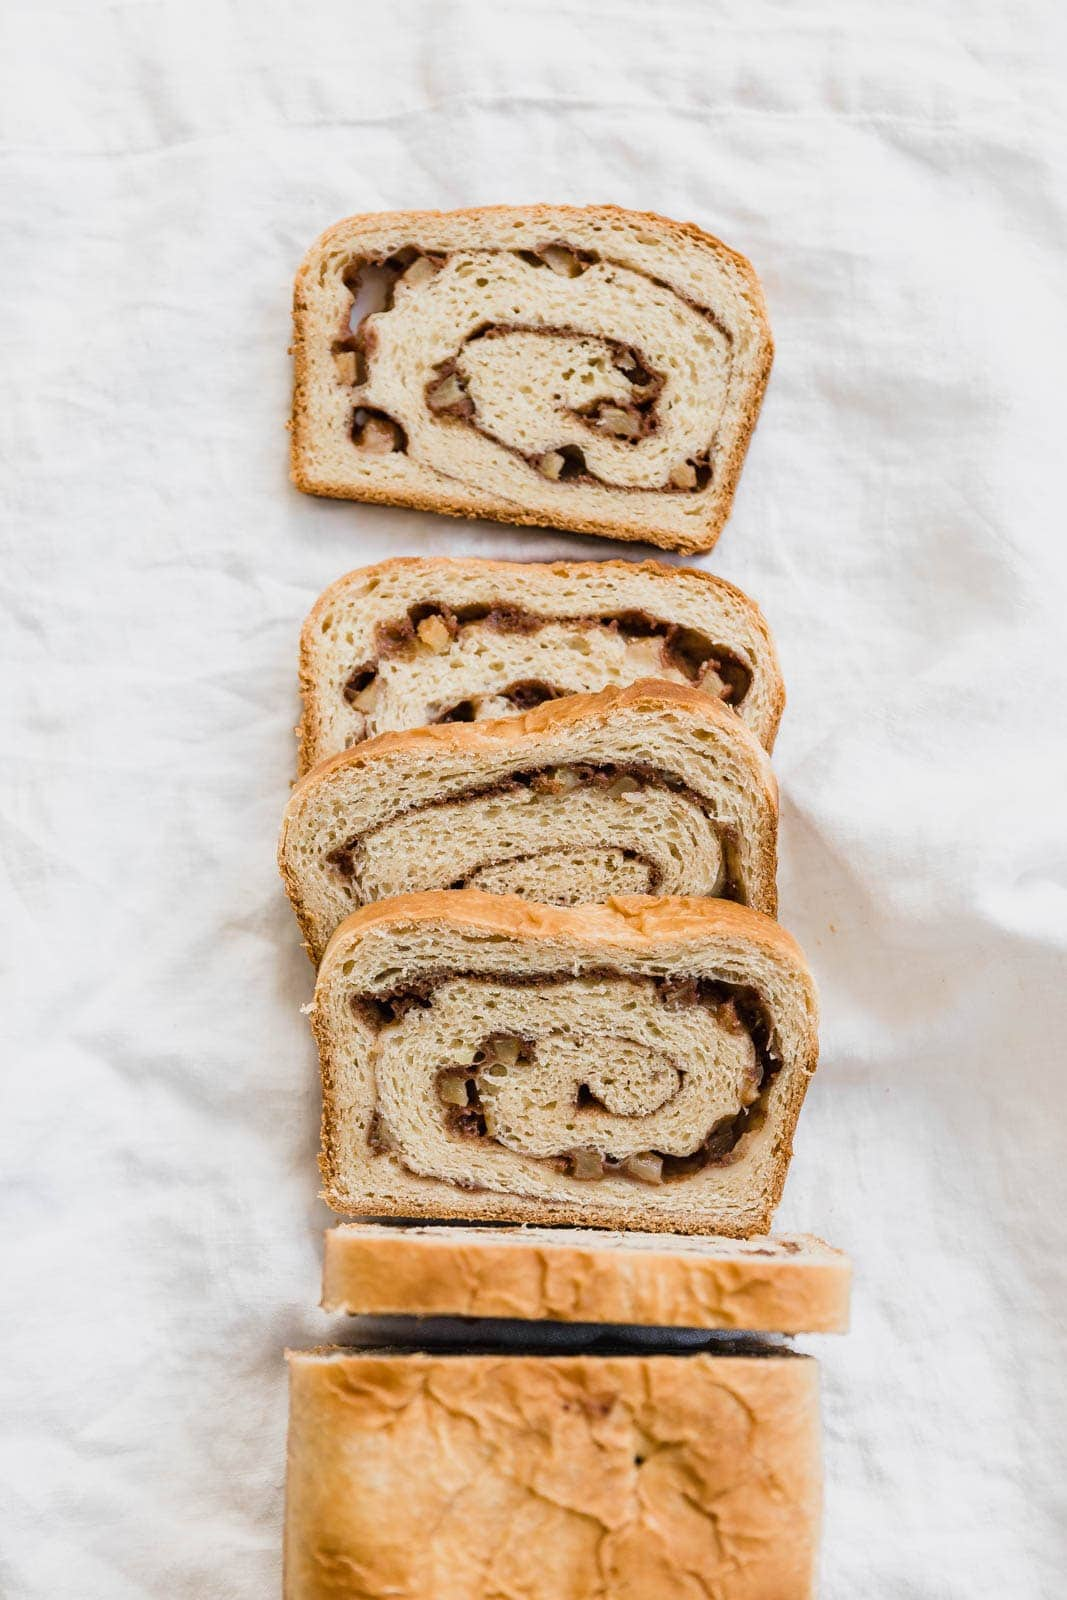 cinnamon swirl bread slices